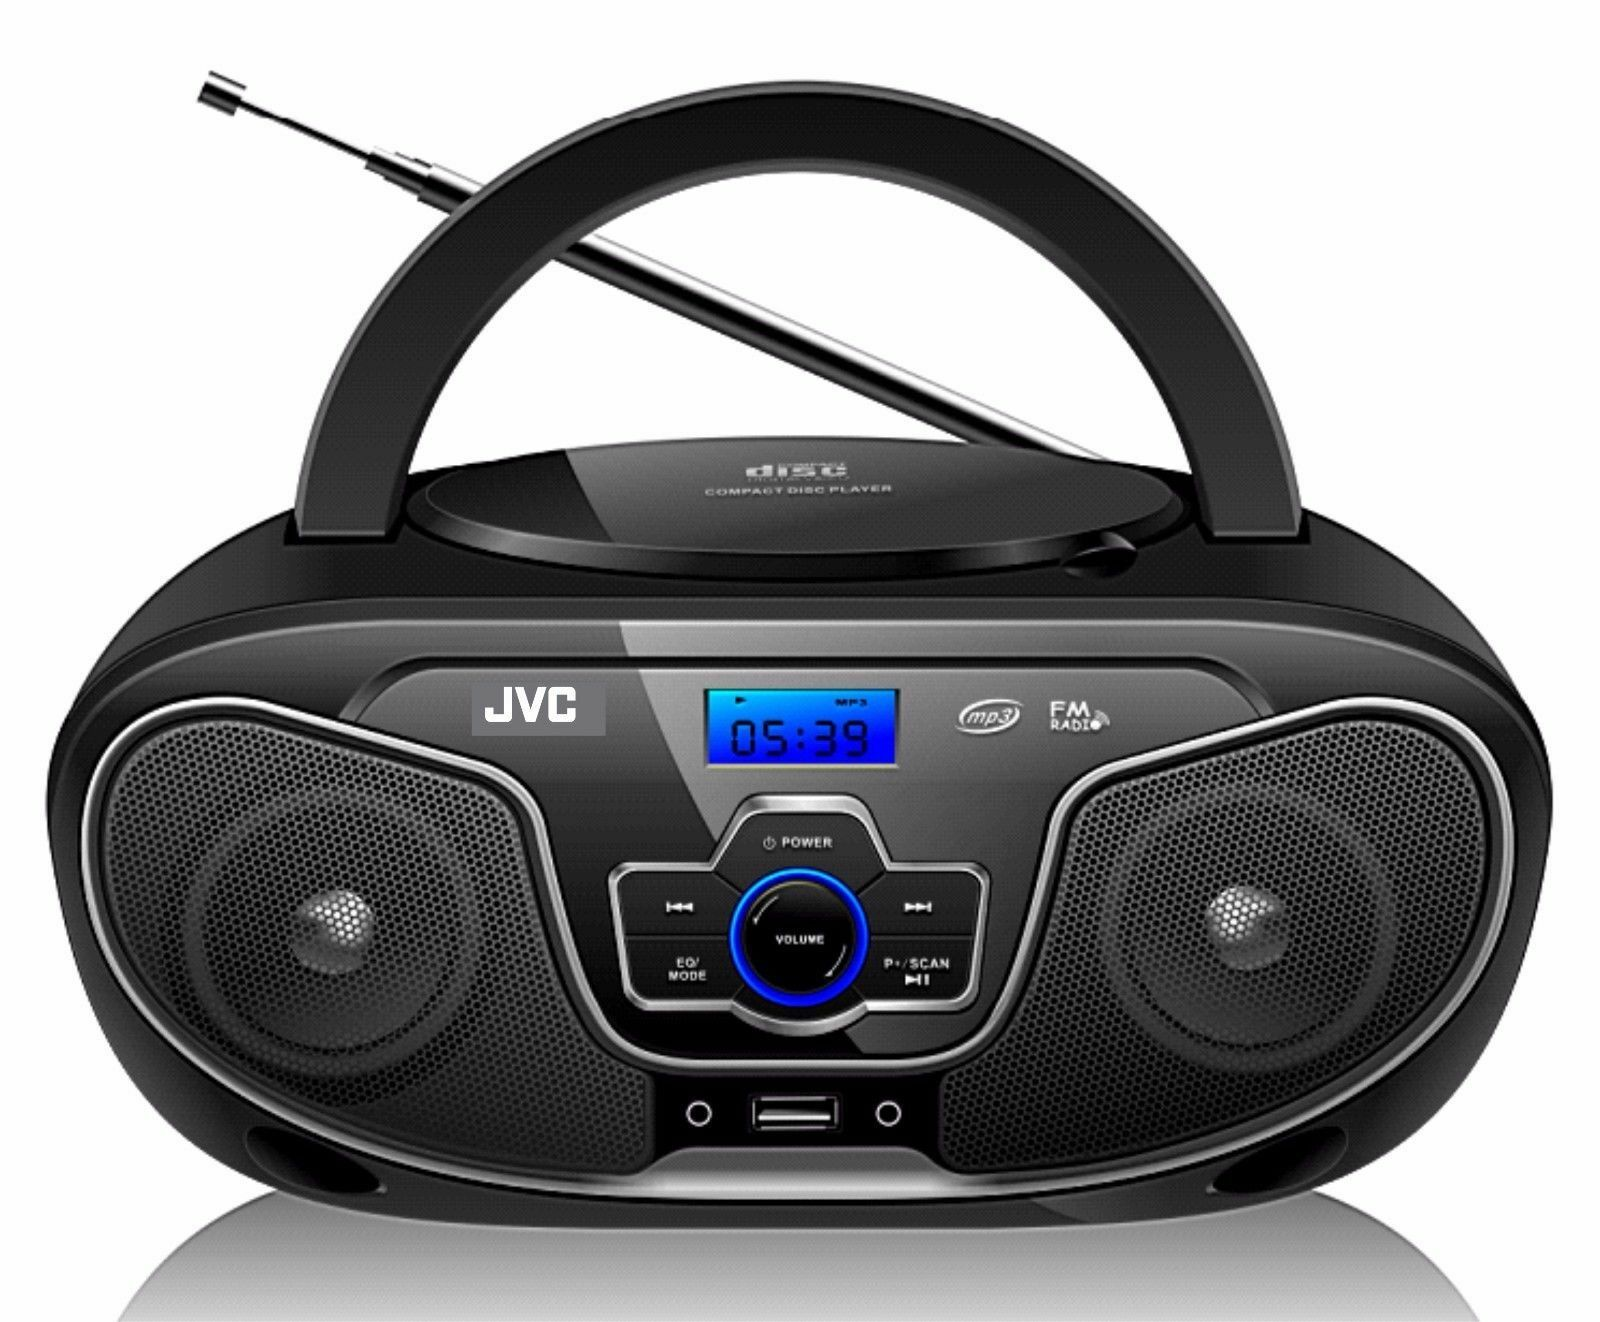 Rádio Portátil Bluetooth Cd Player Jvc Usb